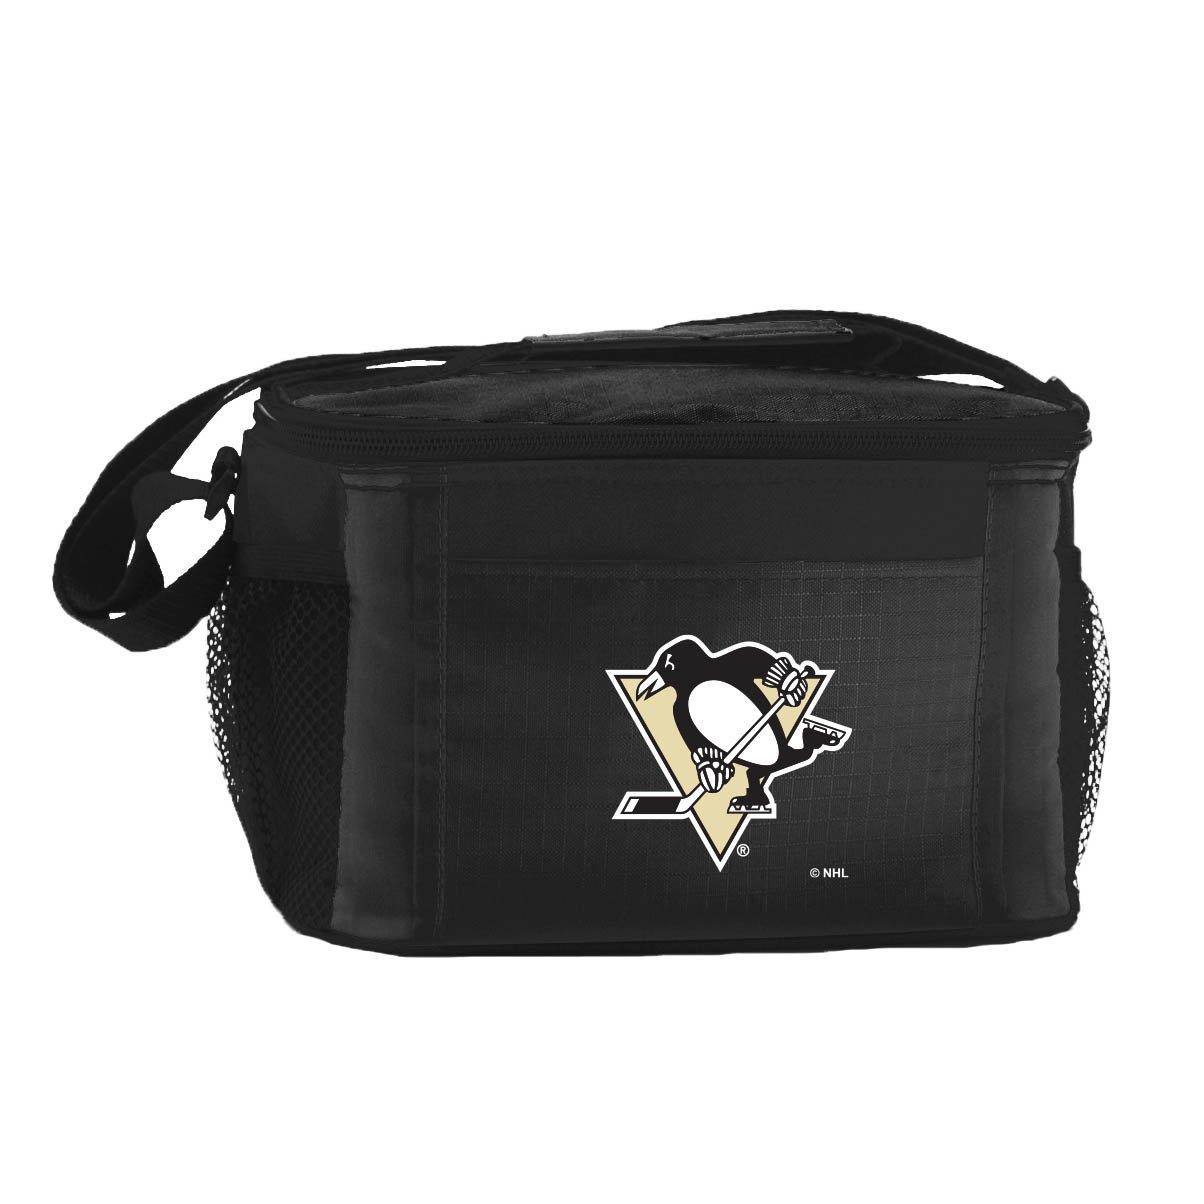 NHL Pittsburgh Penguins Team Logo 6 Can Cooler Bag or Lunch Box - Black